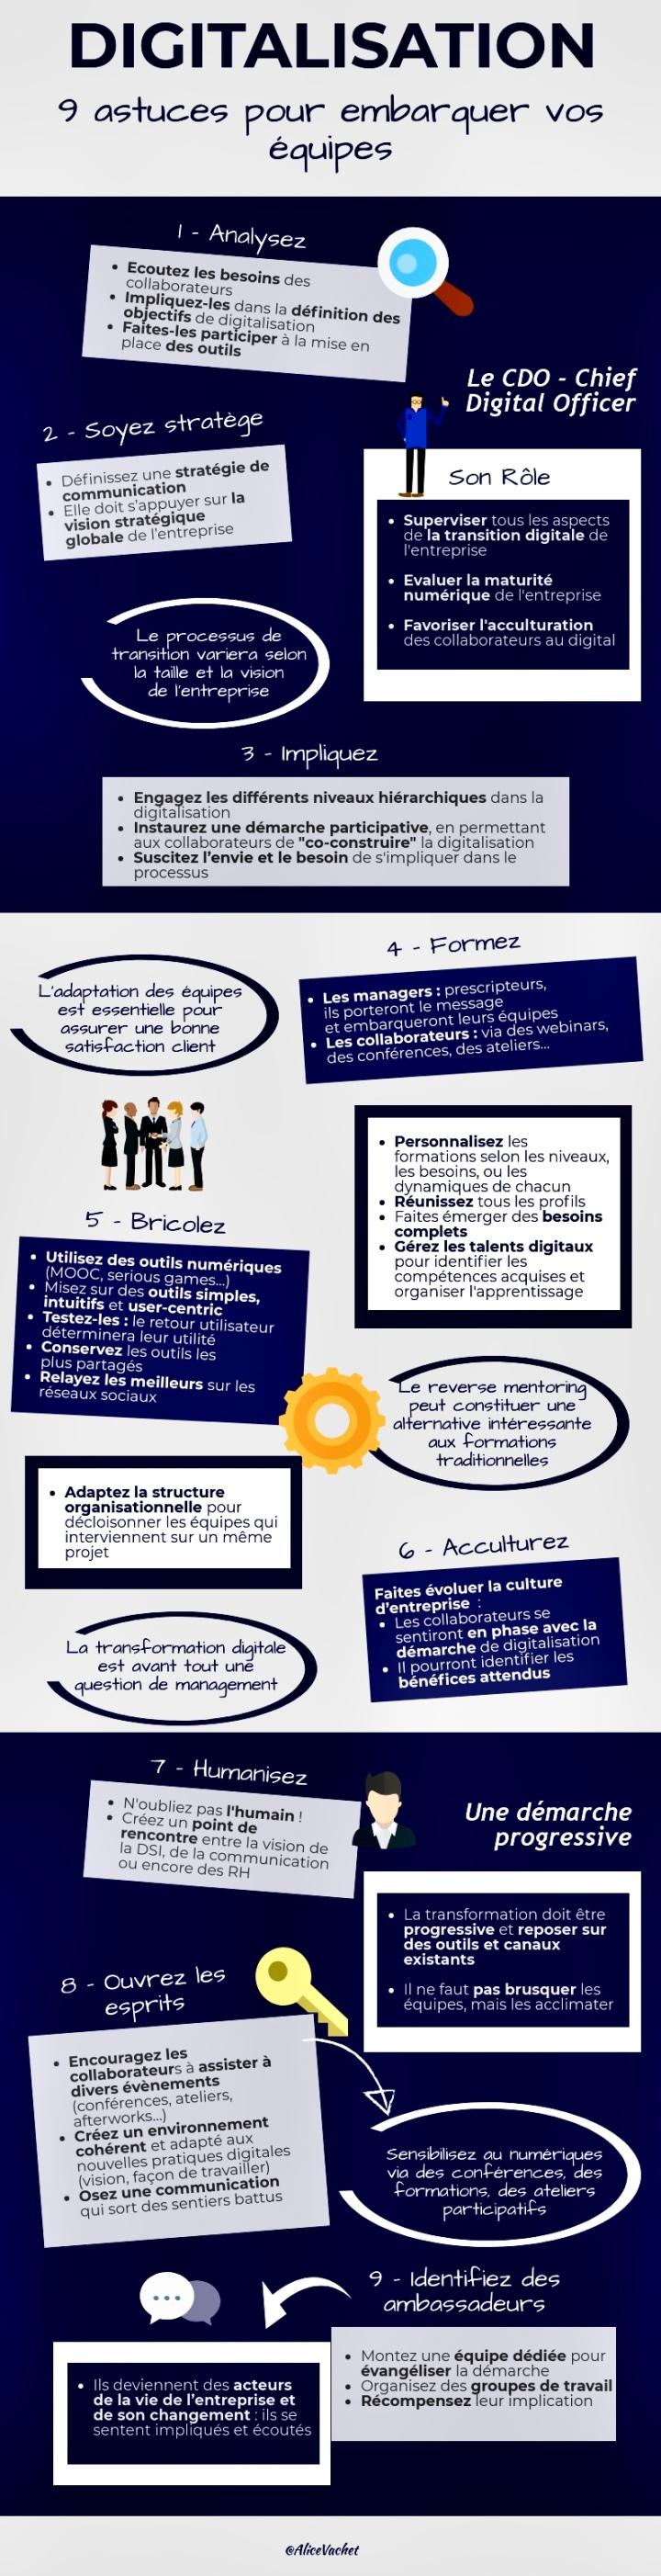 [Infographie] Digitalisation : 9 Astuces pour Embarquer vos Equipes💡